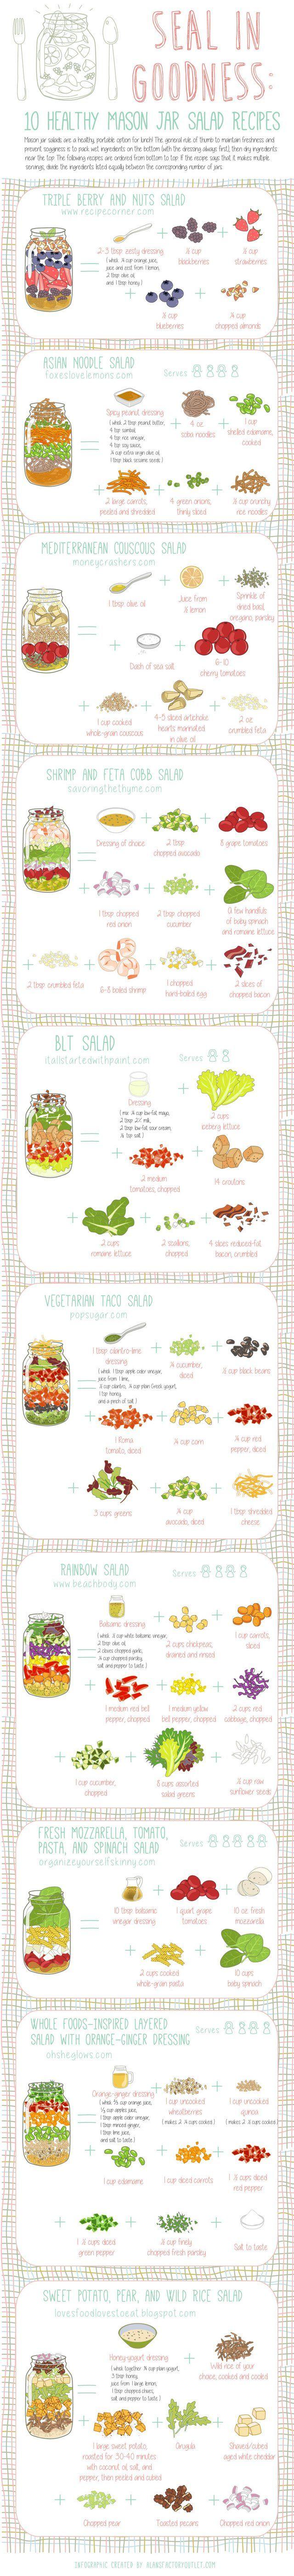 10 healthy mason jar salad recipes! - Imgur